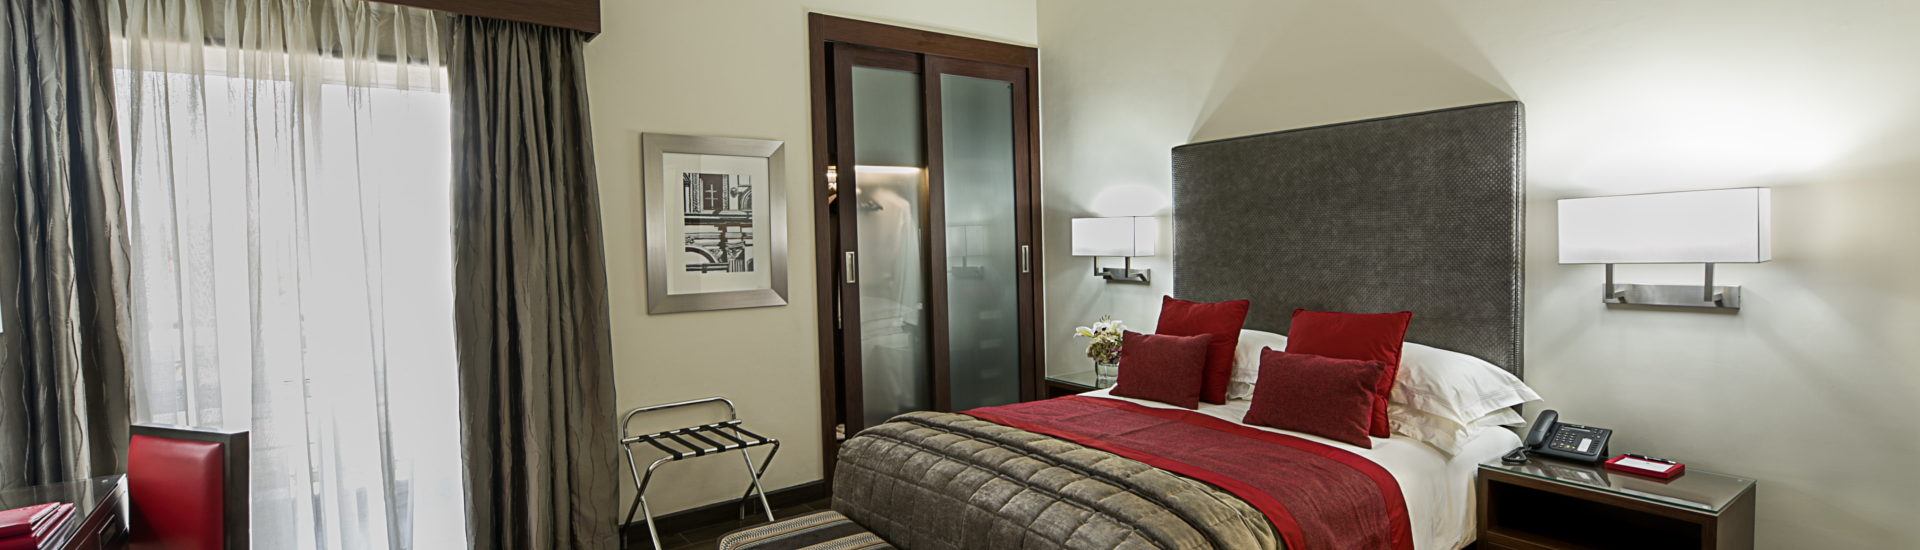 The George Hotel. image credit: Mantis